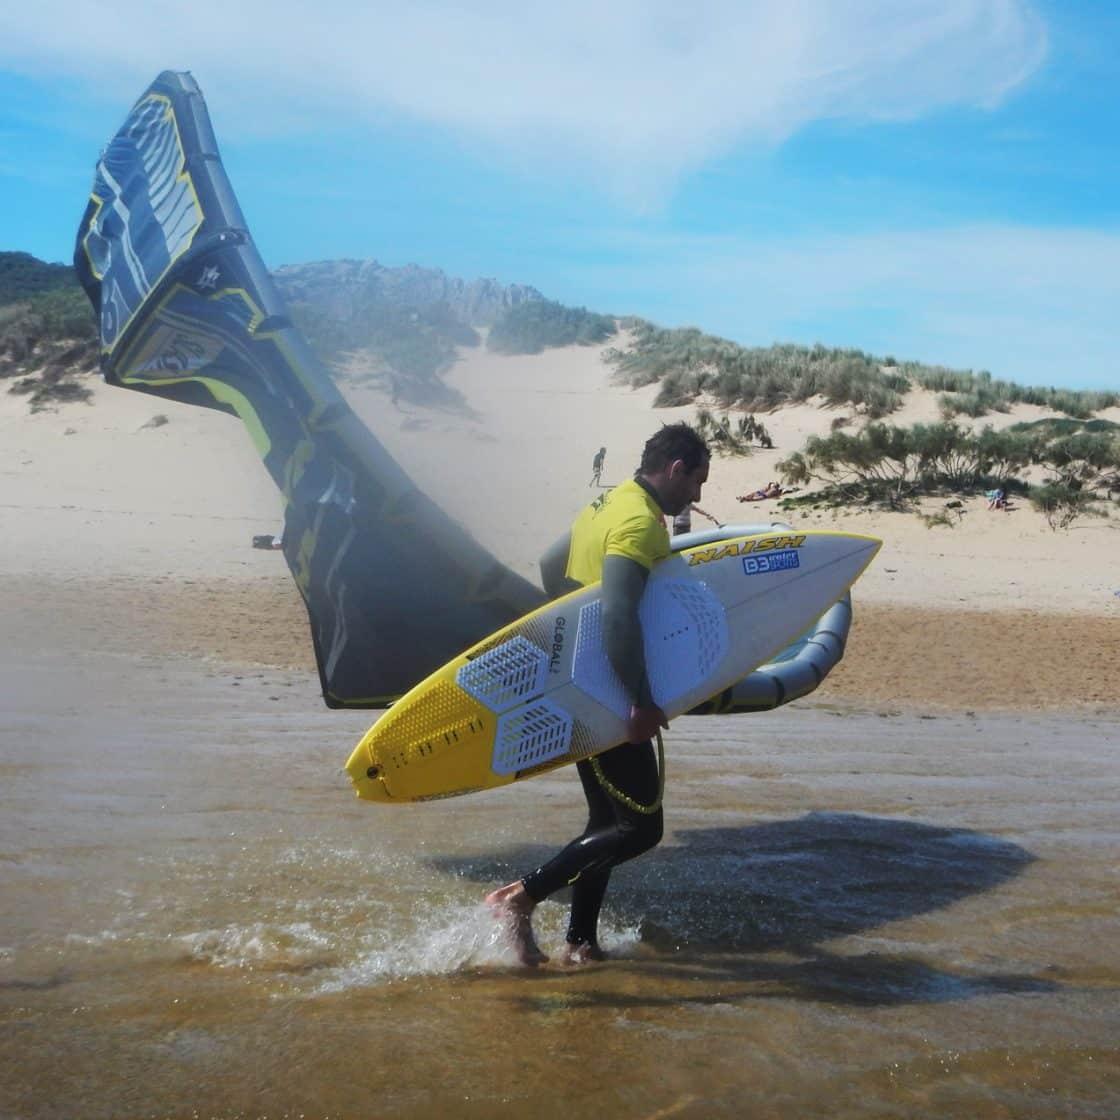 Valdesvaqueros beach, Tarifa in spain. Naish equipment